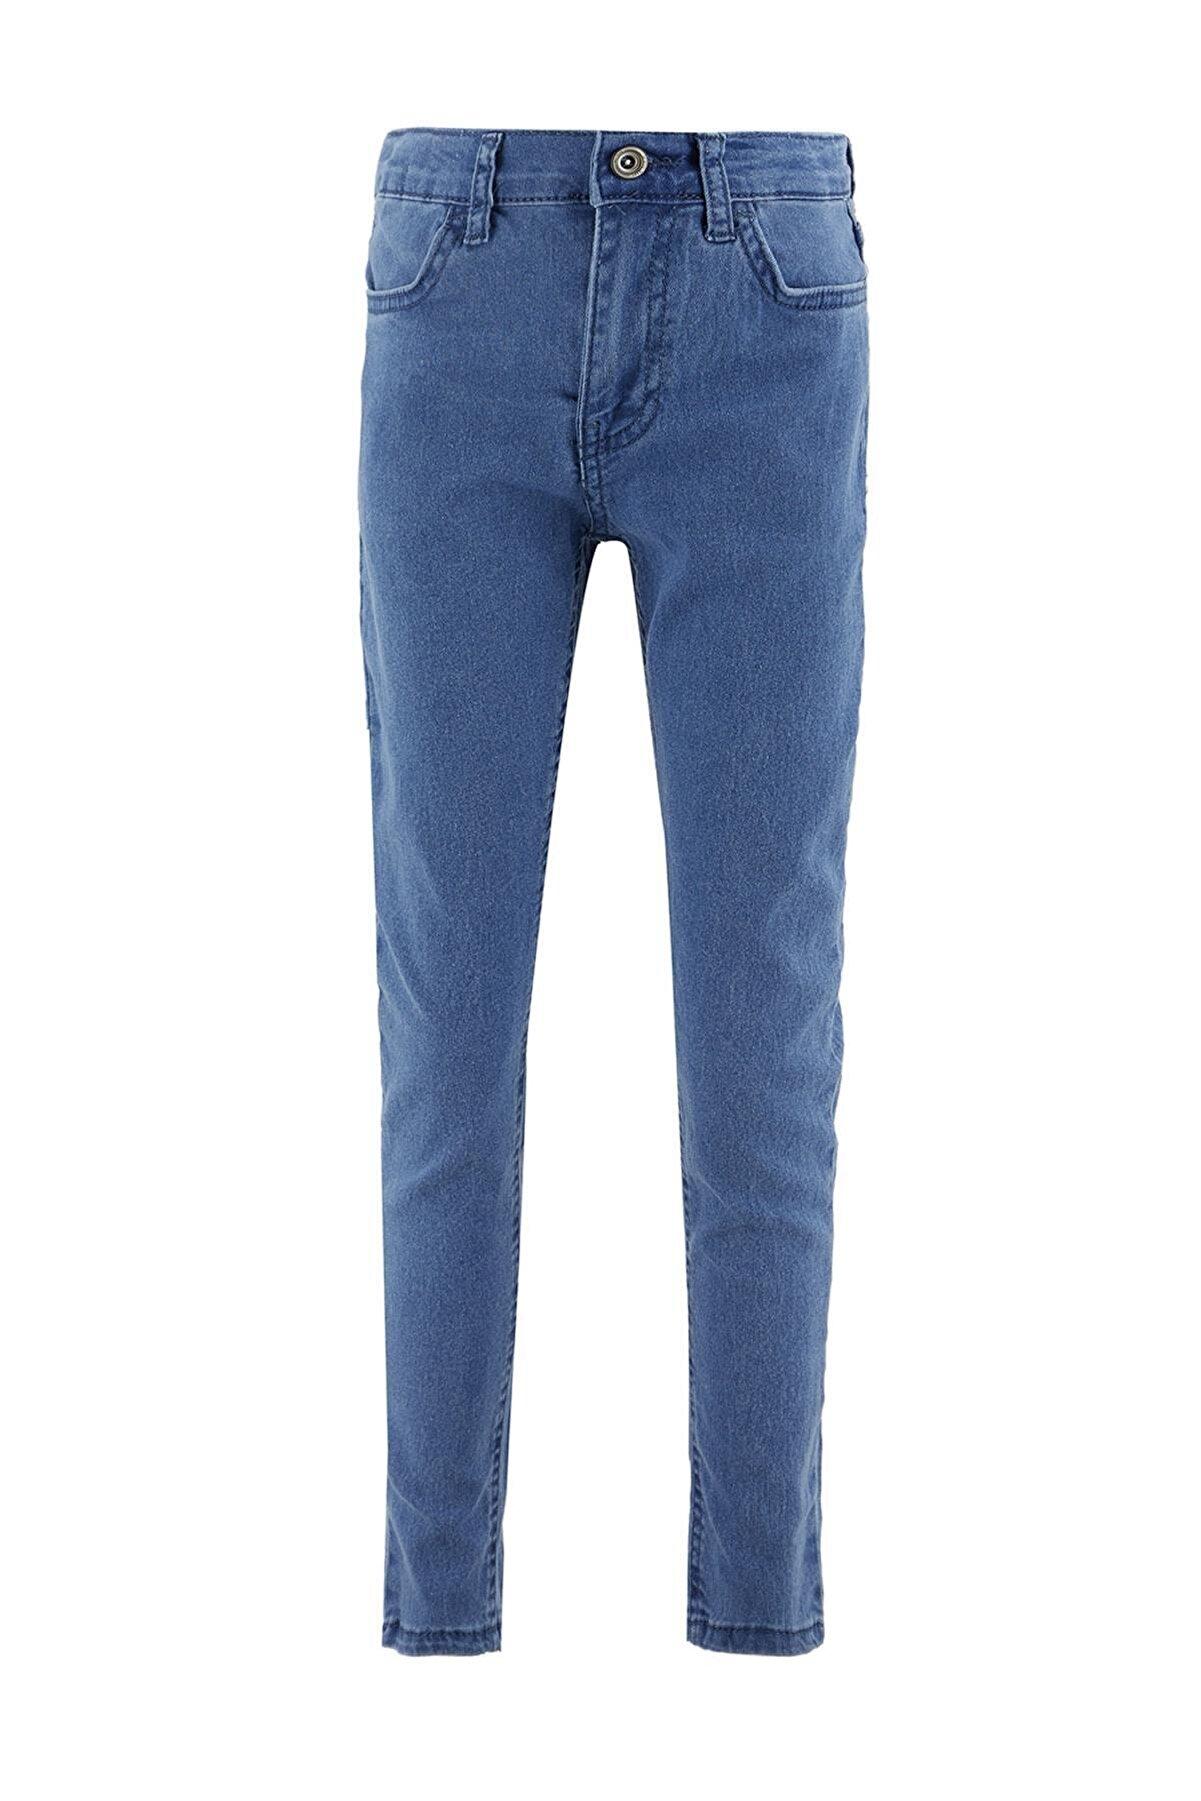 Defacto Erkek Çocuk Slim Fit Jean Pantolon S9867A621SPB